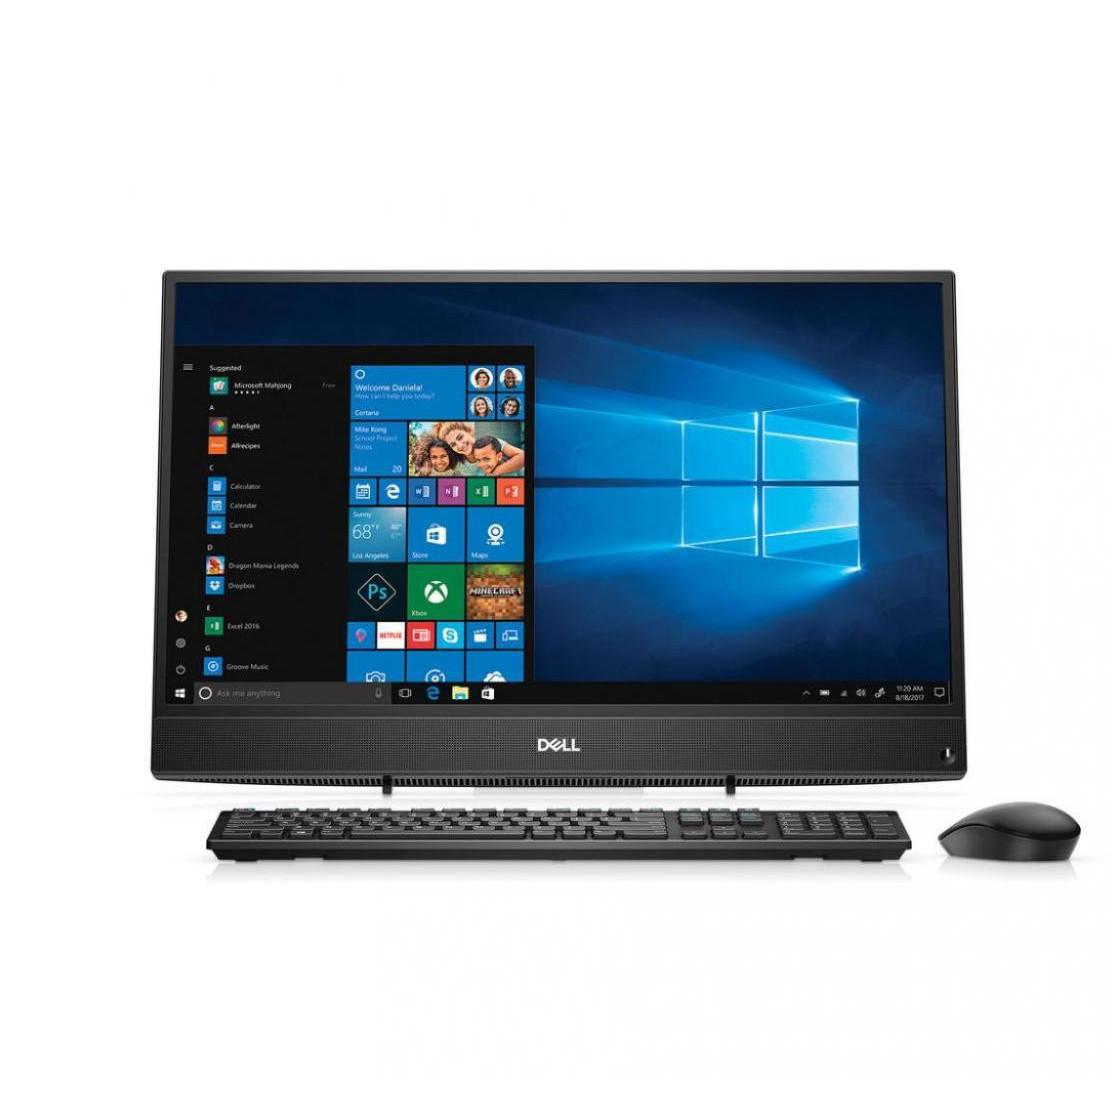 Моноблок Dell Inspiron 3480 Intel Core i3 2 ядра 4 Гб HDD 1Тб Windows 10 210-ARLH_2